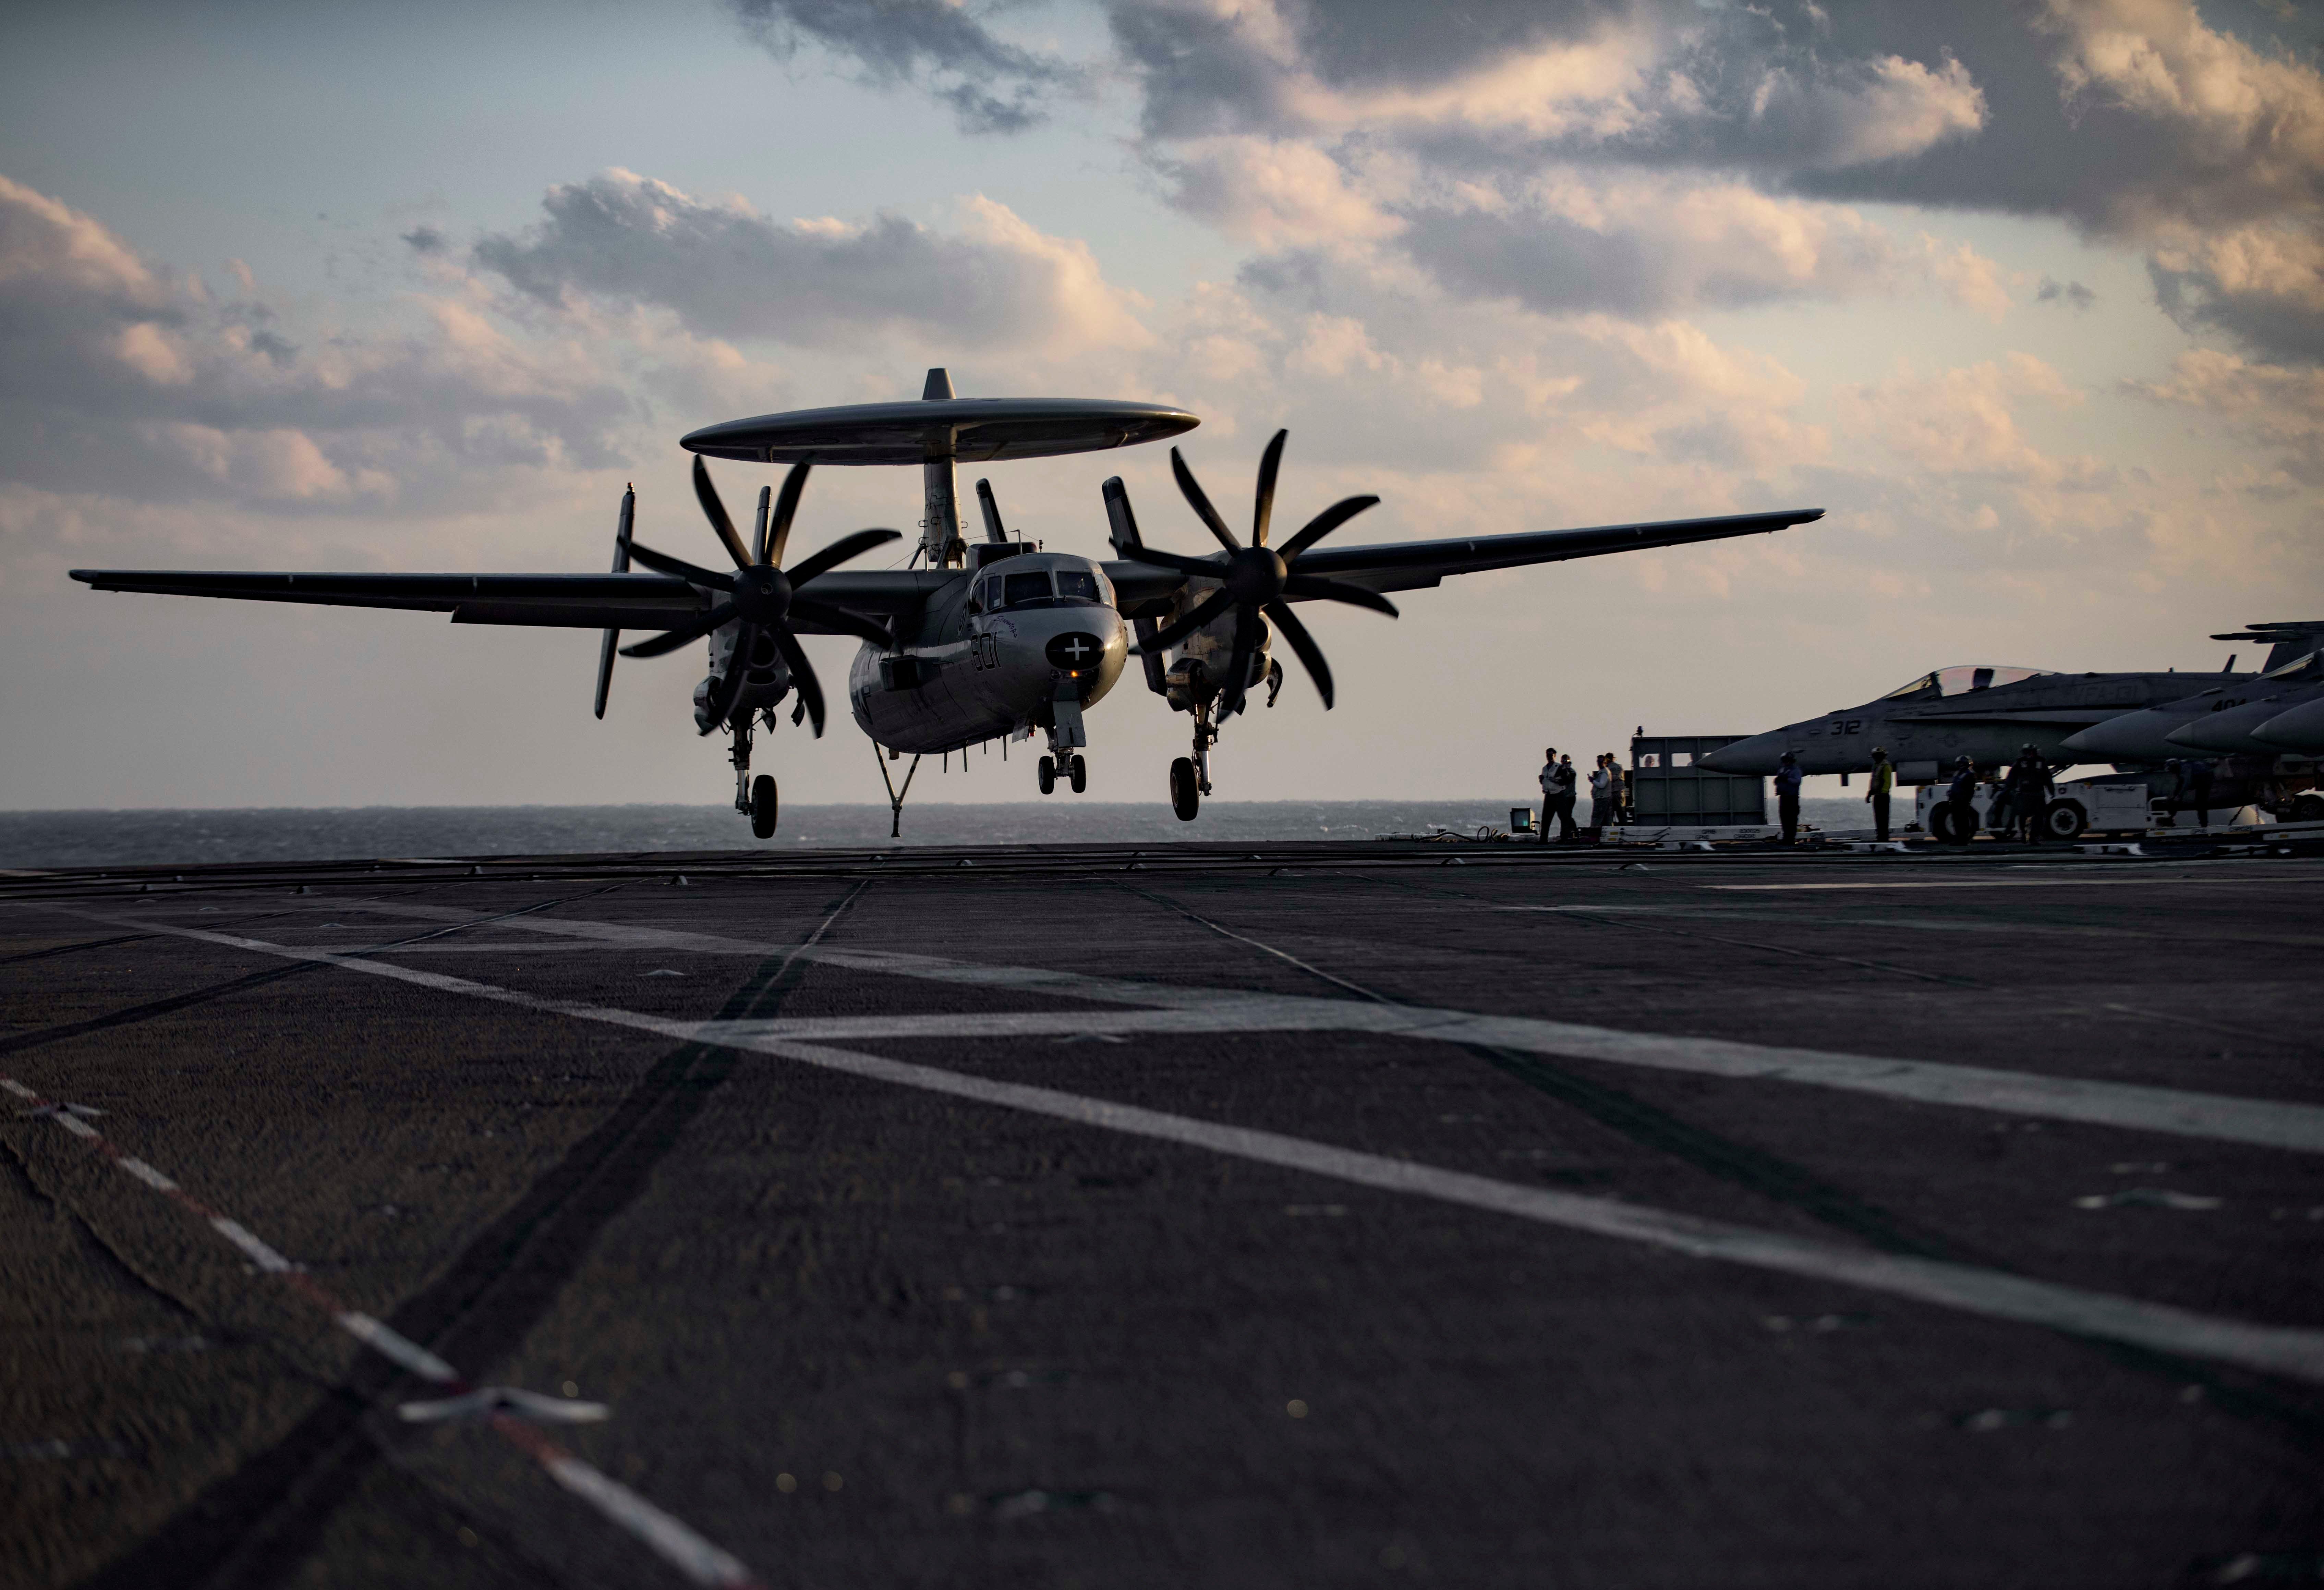 (U.S. Navy photo by Mass Communication Specialist 3rd Class J. Alexander Delgado/Released)